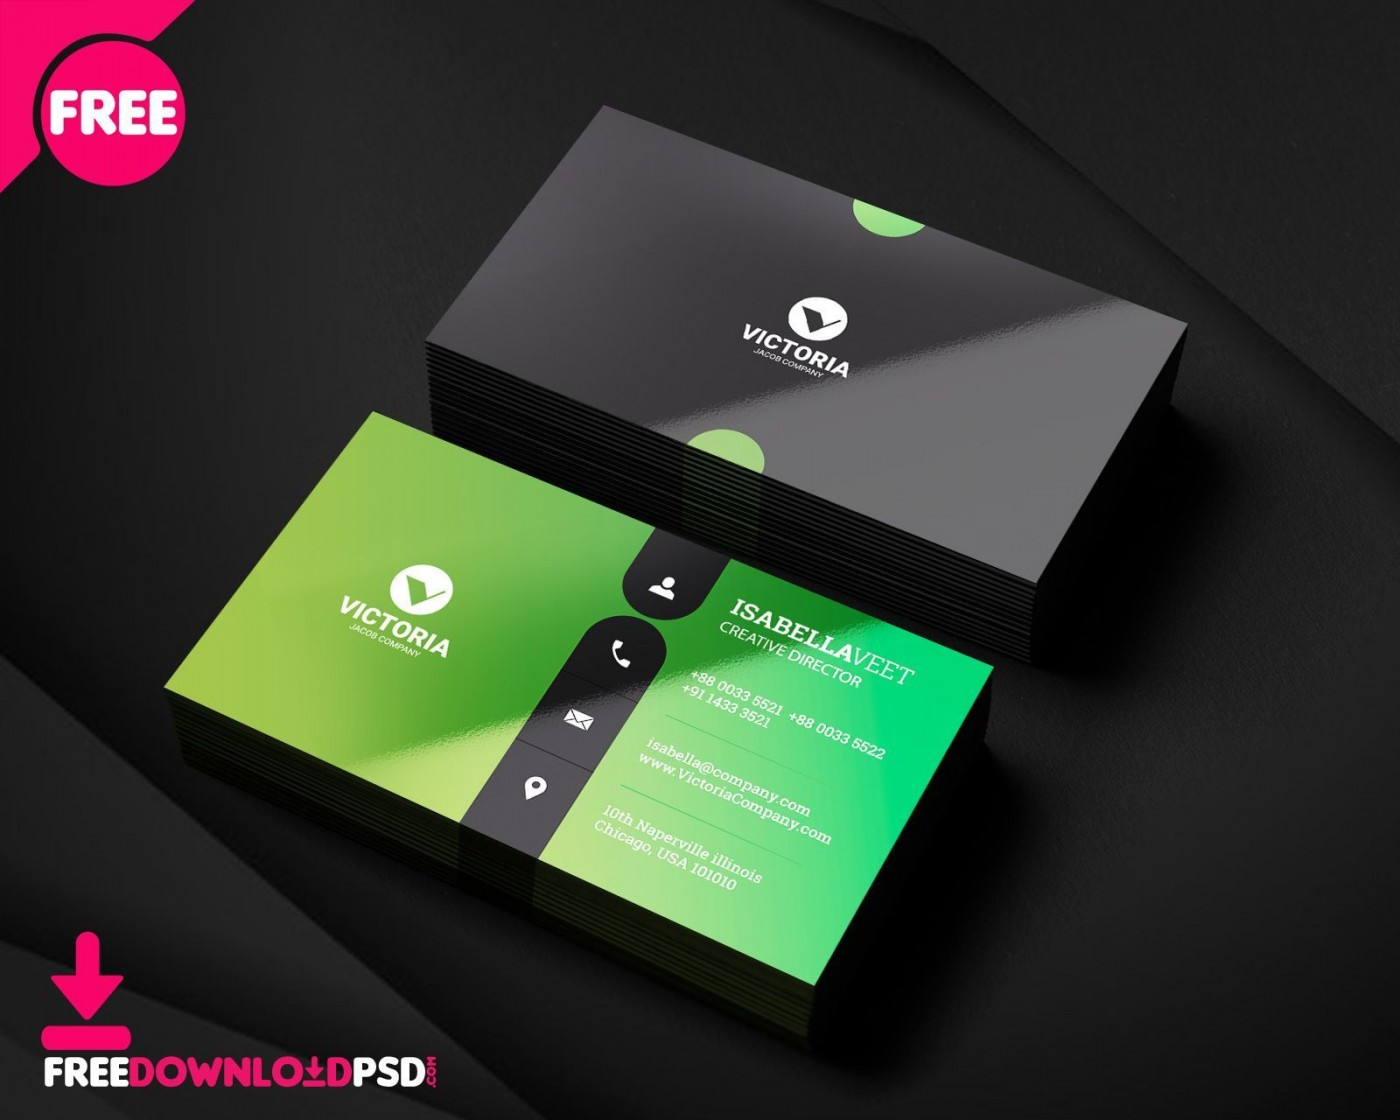 001 Wonderful Simple Visiting Card Design Free Download Image  Busines Psd File1400